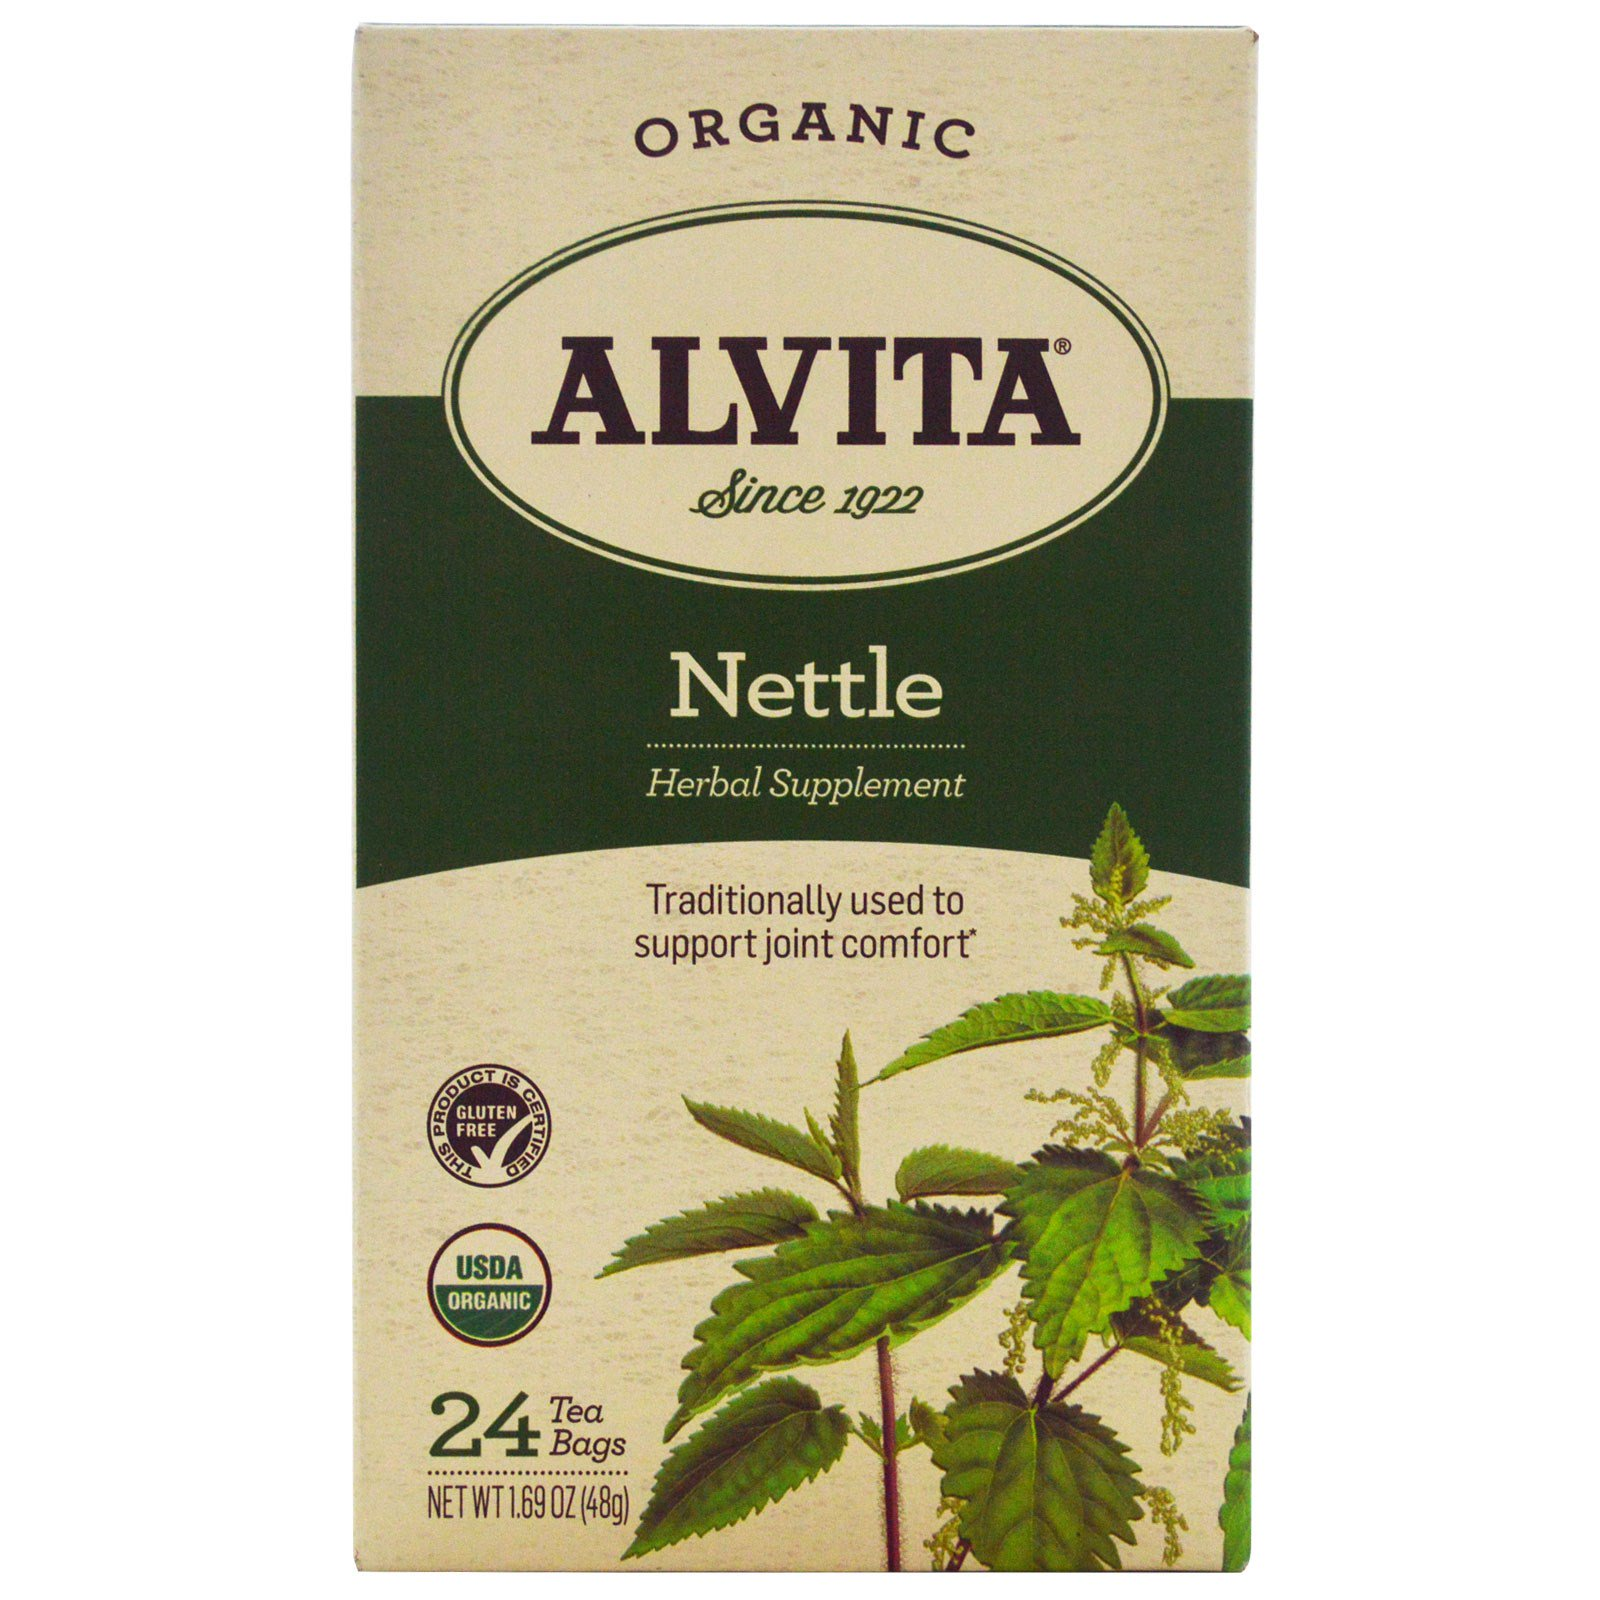 Alvita Teas, Organic, чай с крапивой, без кофеина, 24 чайных пакетика, по 1,69 унции (48 г) каждый